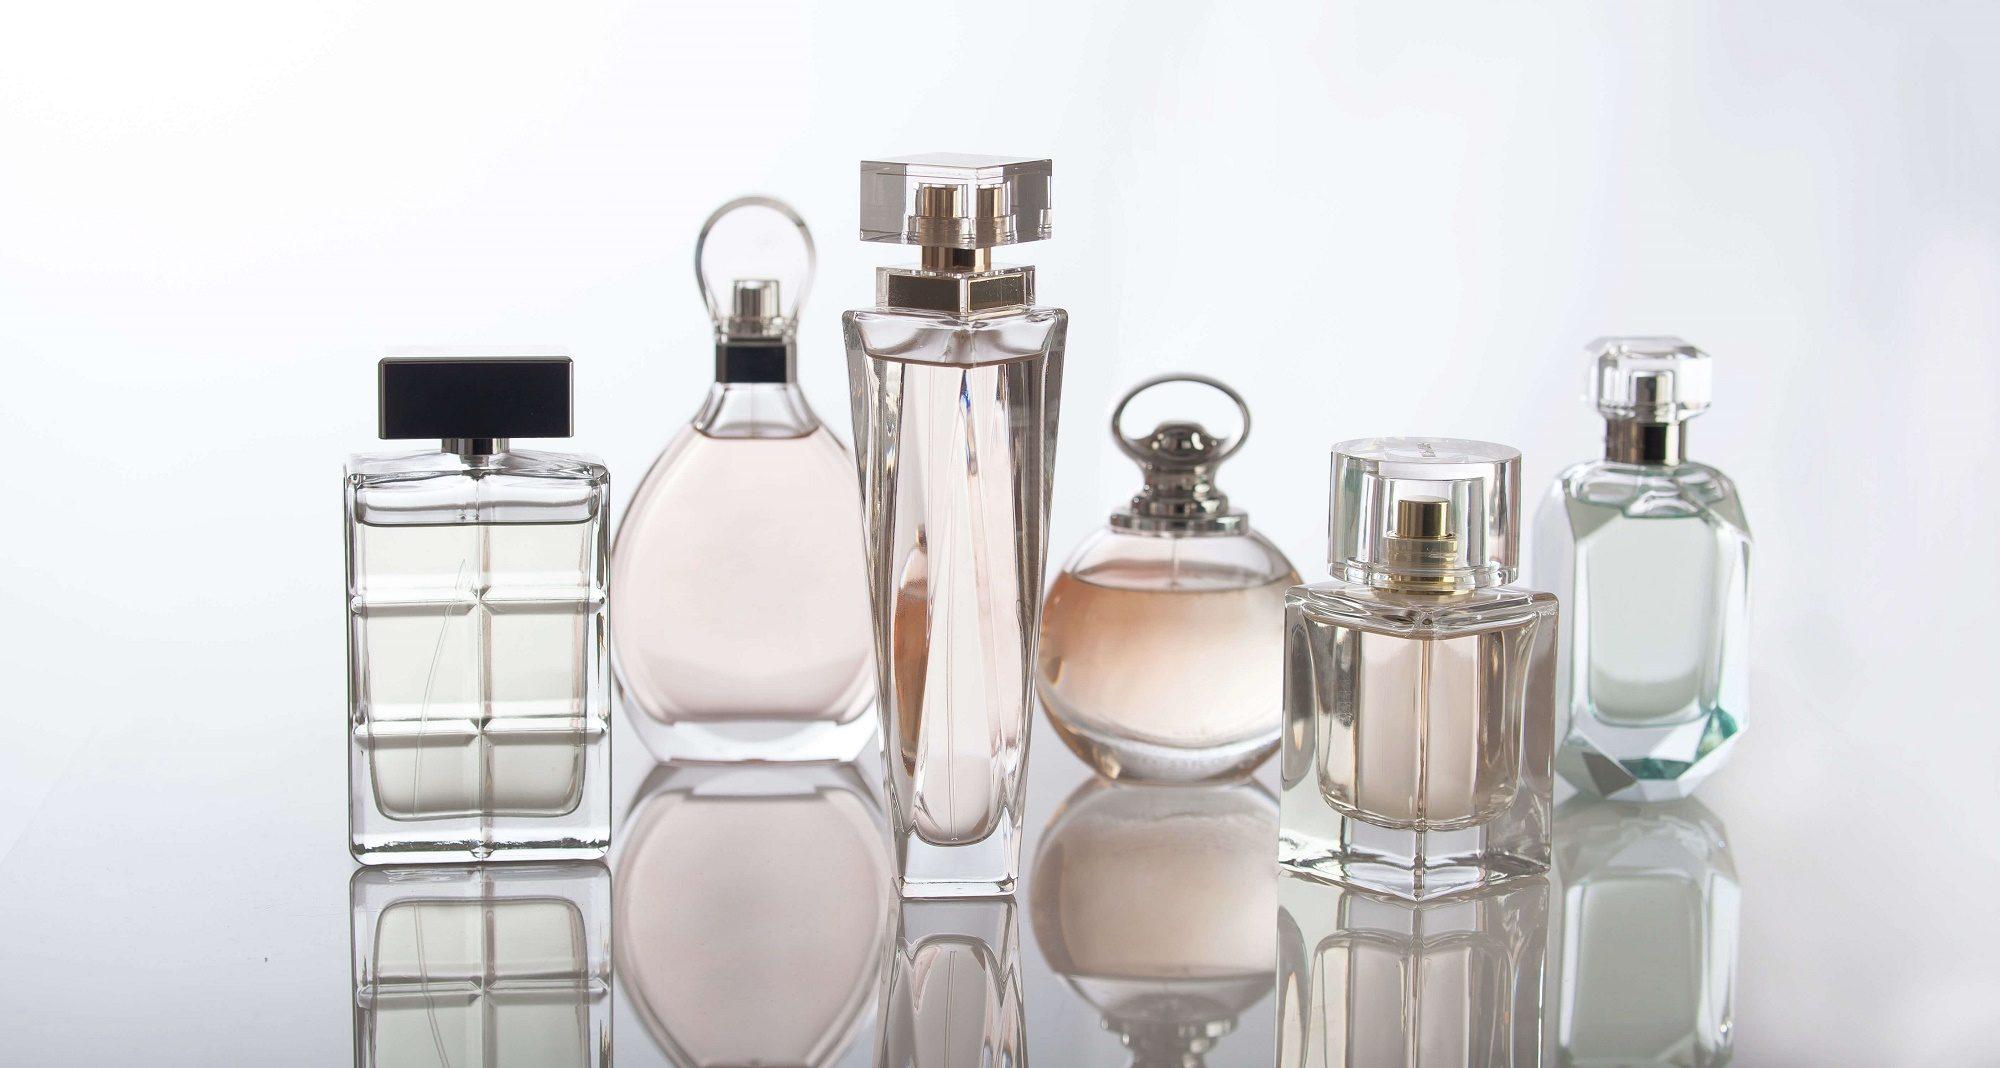 Kontakt Parfümerie Kielgast